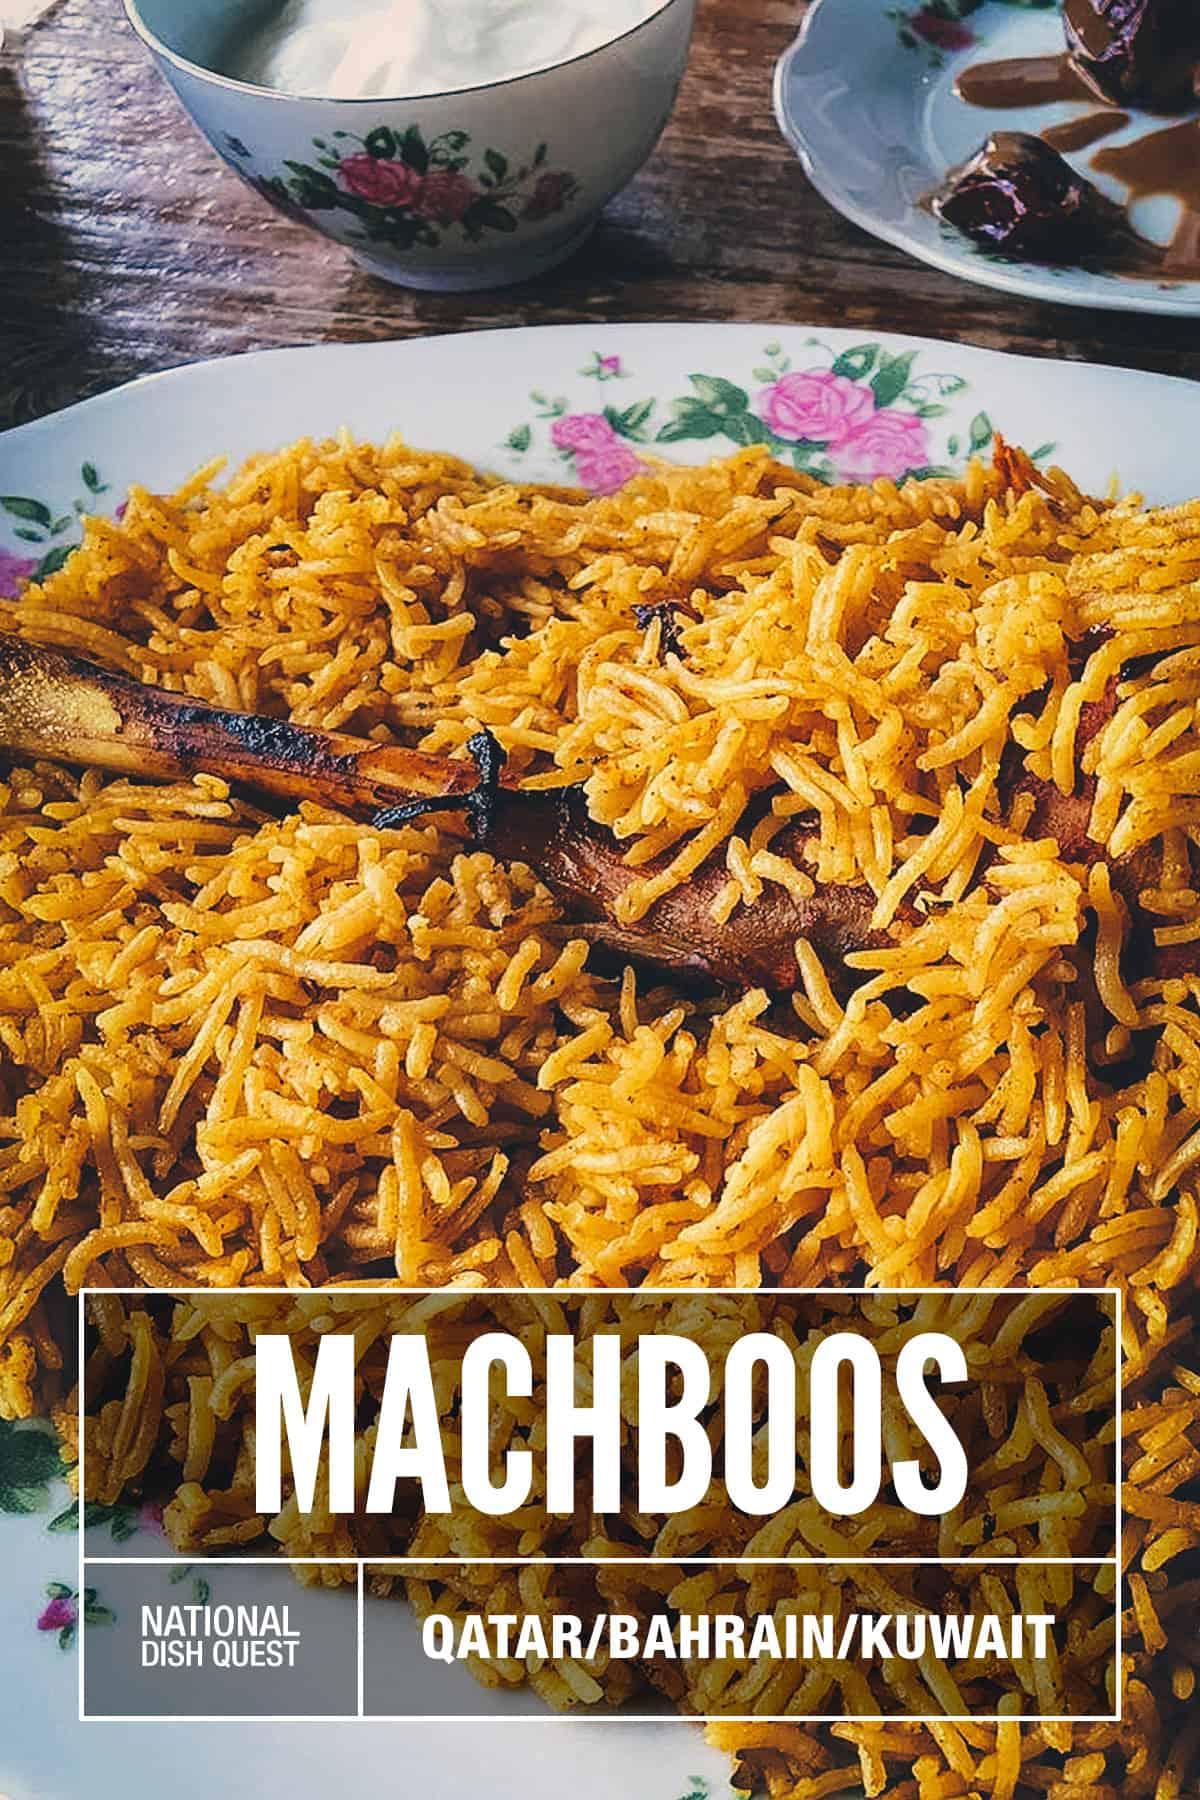 Machboos